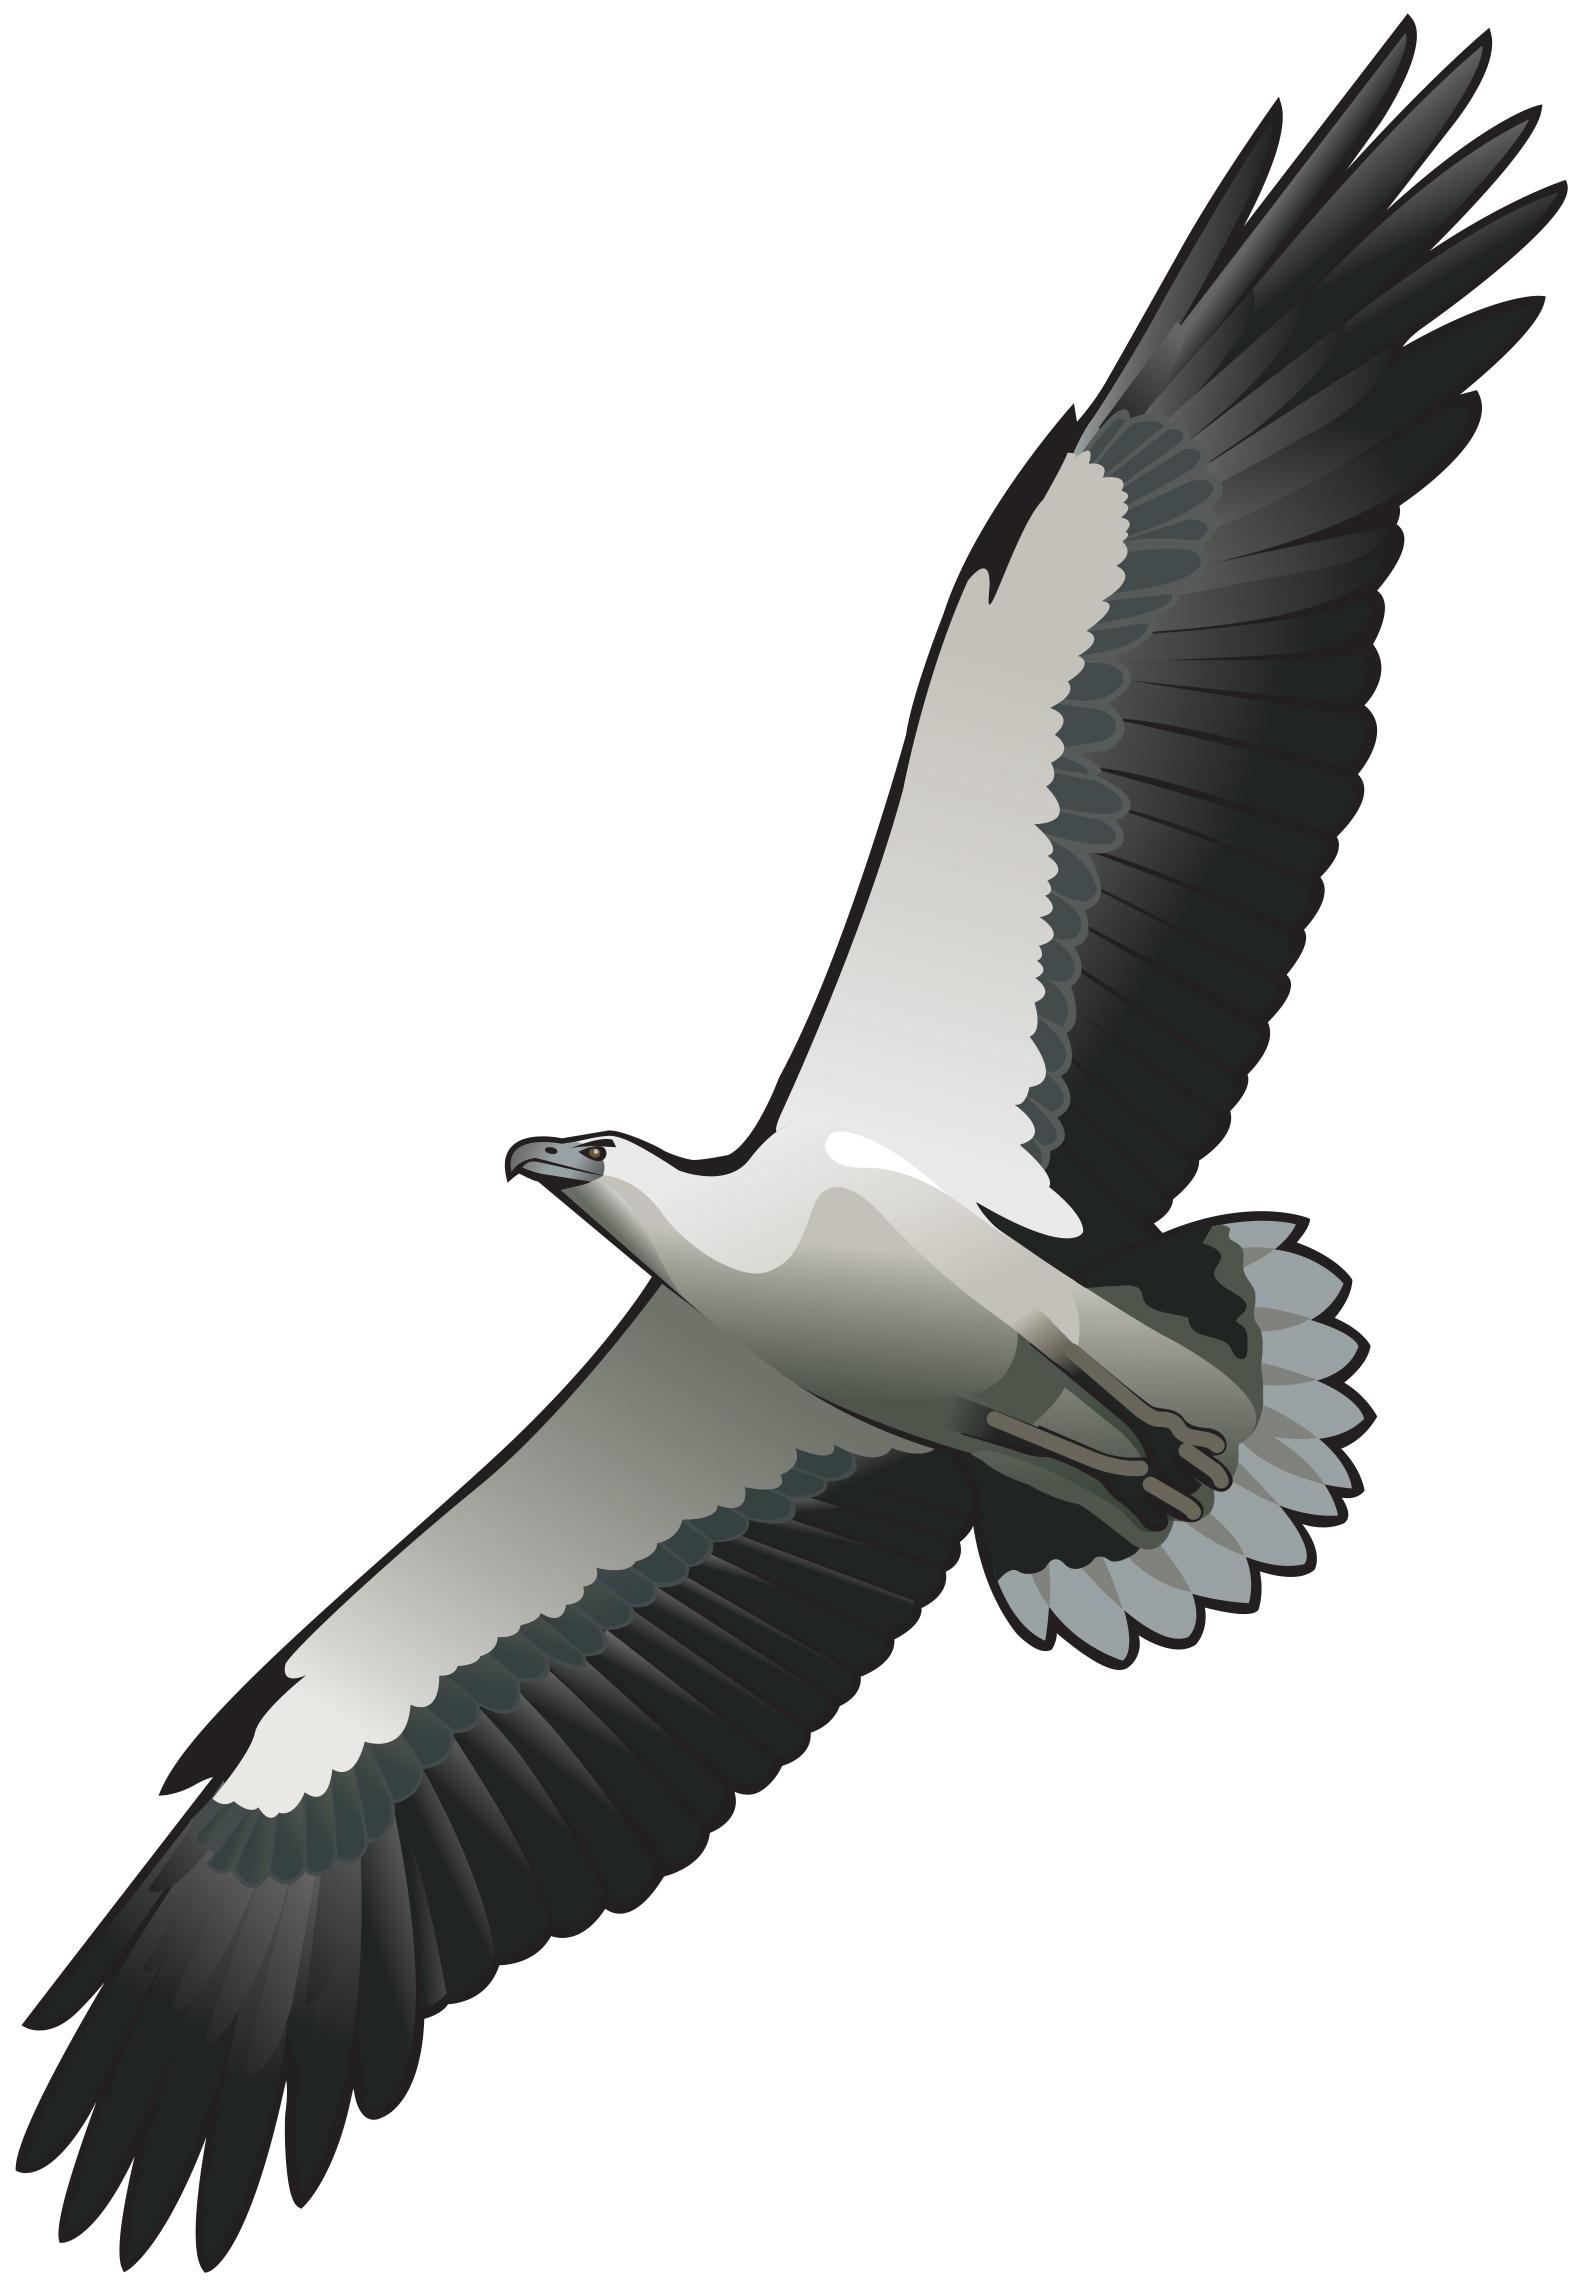 https://www.thalabeach.com.au/wp-content/uploads/2014/11/TBNR-Sea-eagle.jpg